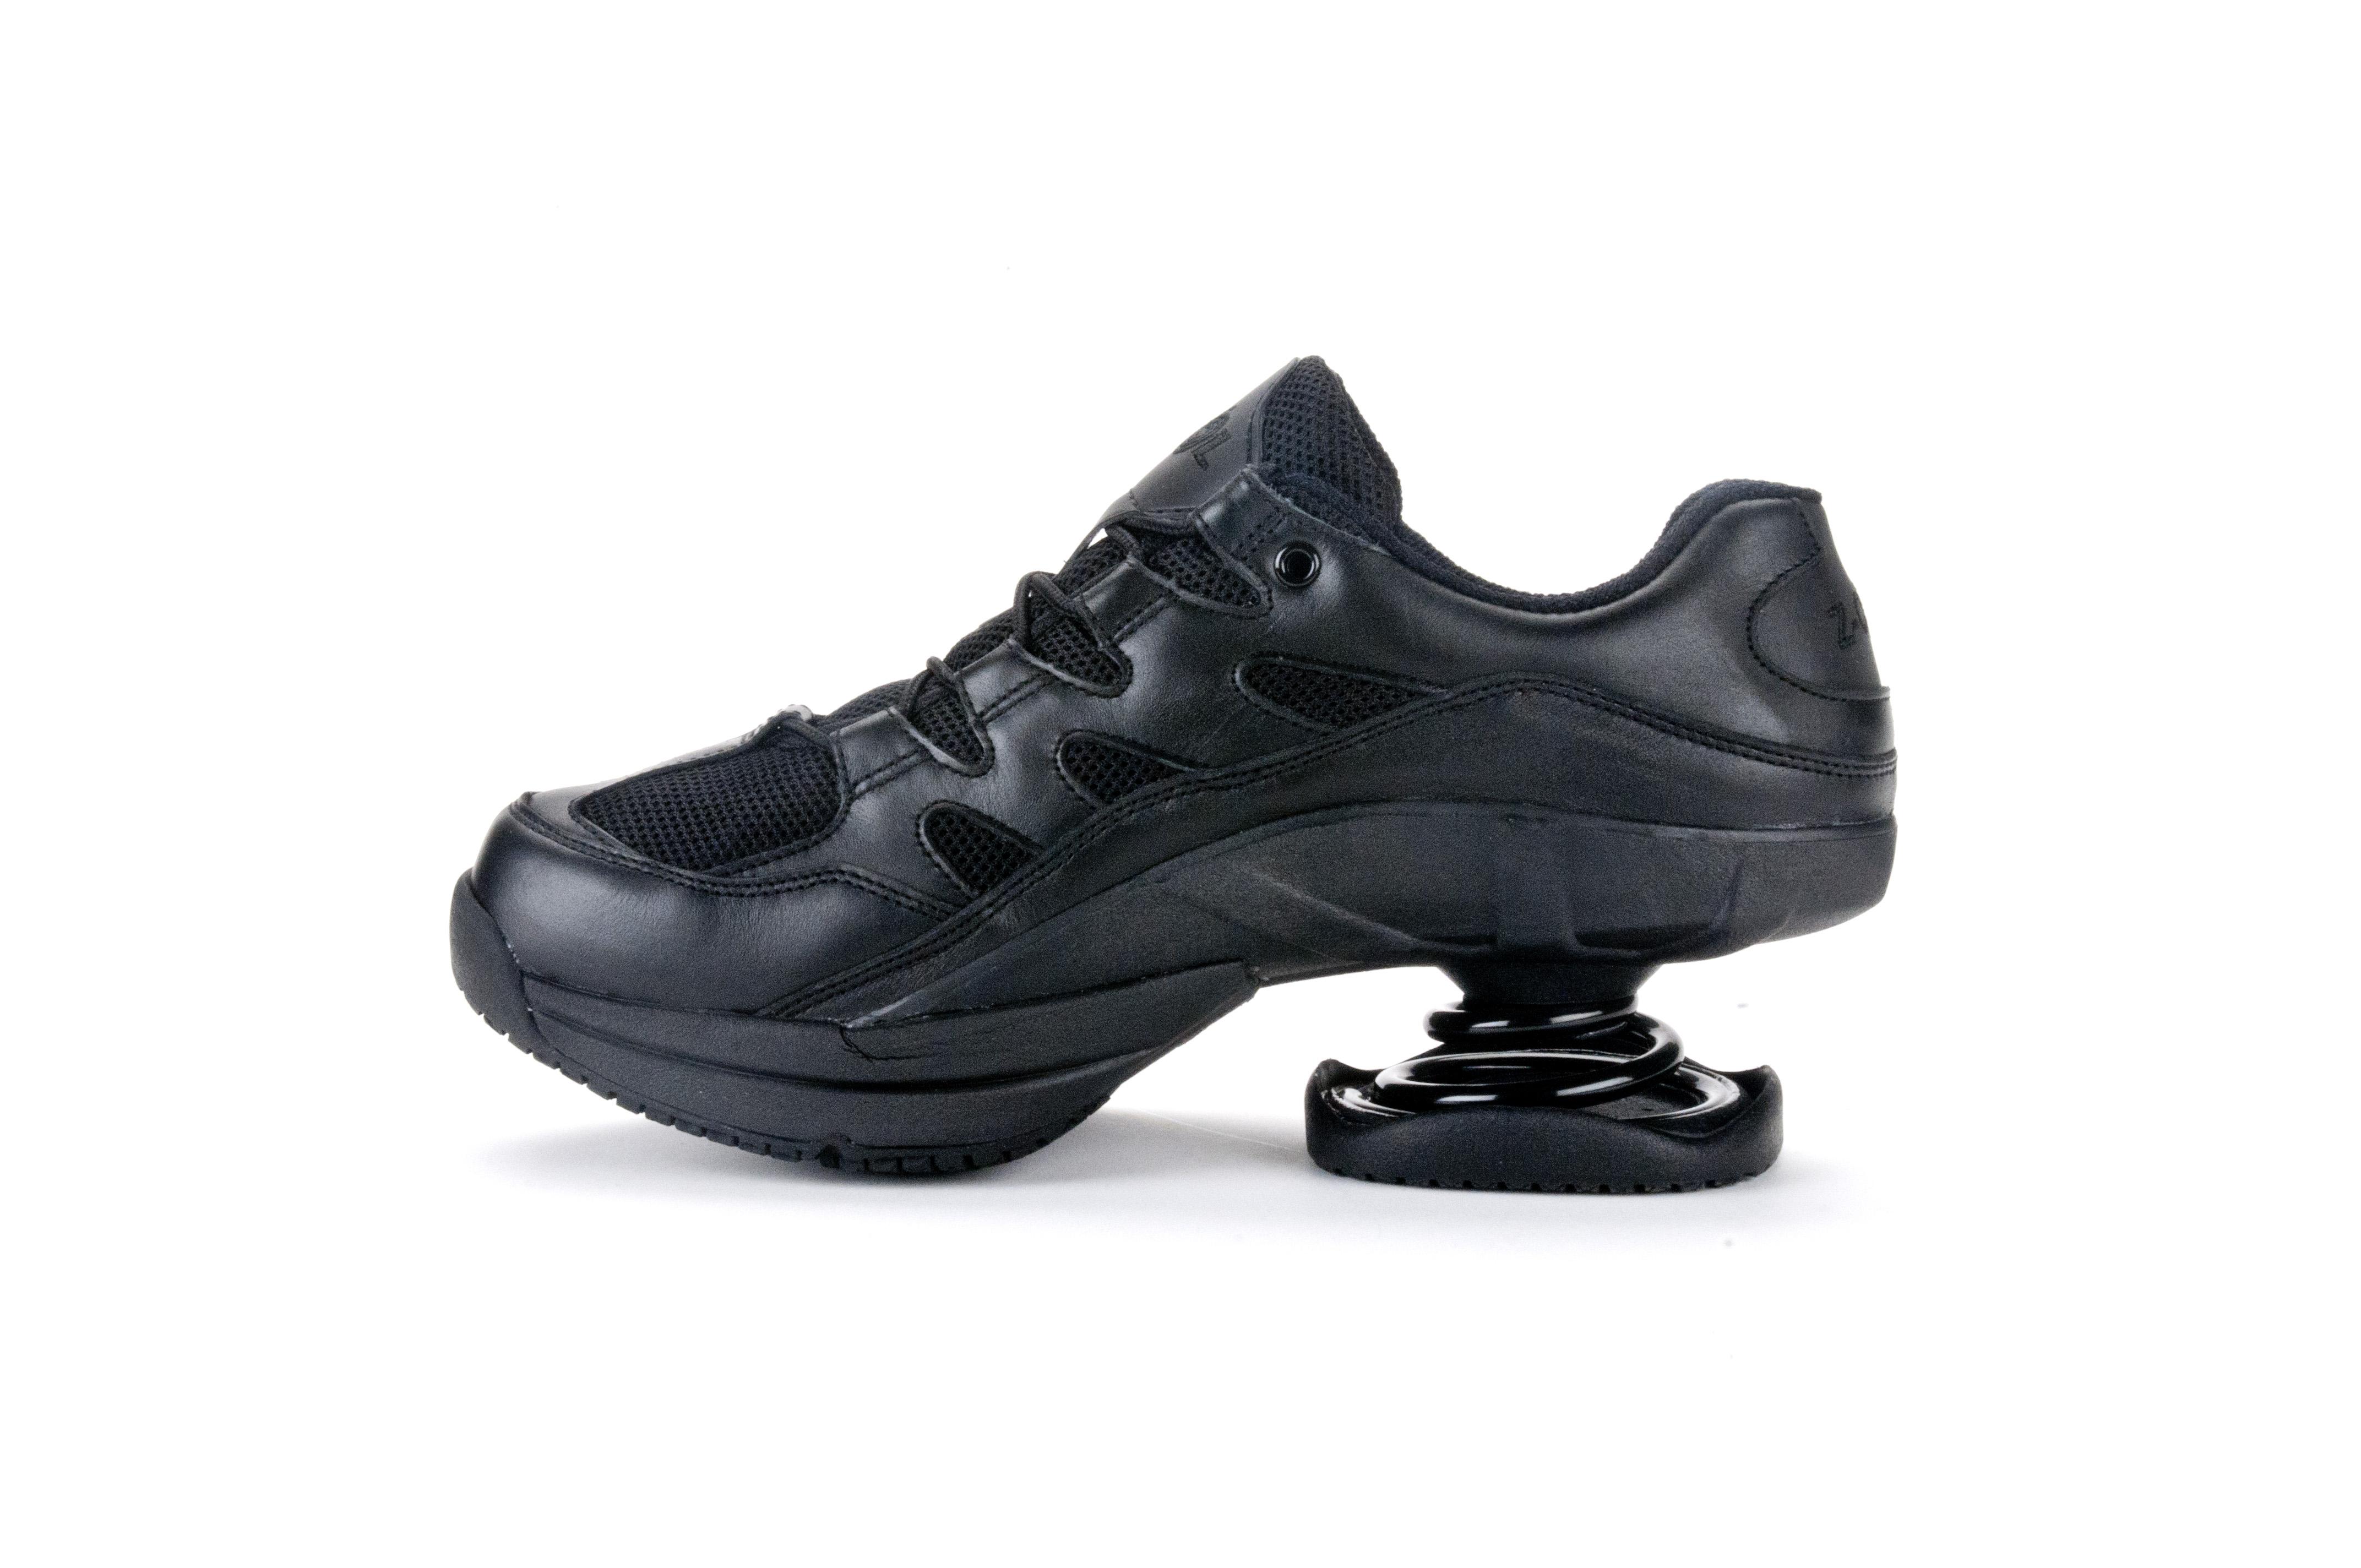 c744379856ad Z-Coil FW-02020 Freedom Black Slip Resistant - River Valley Comfort ...